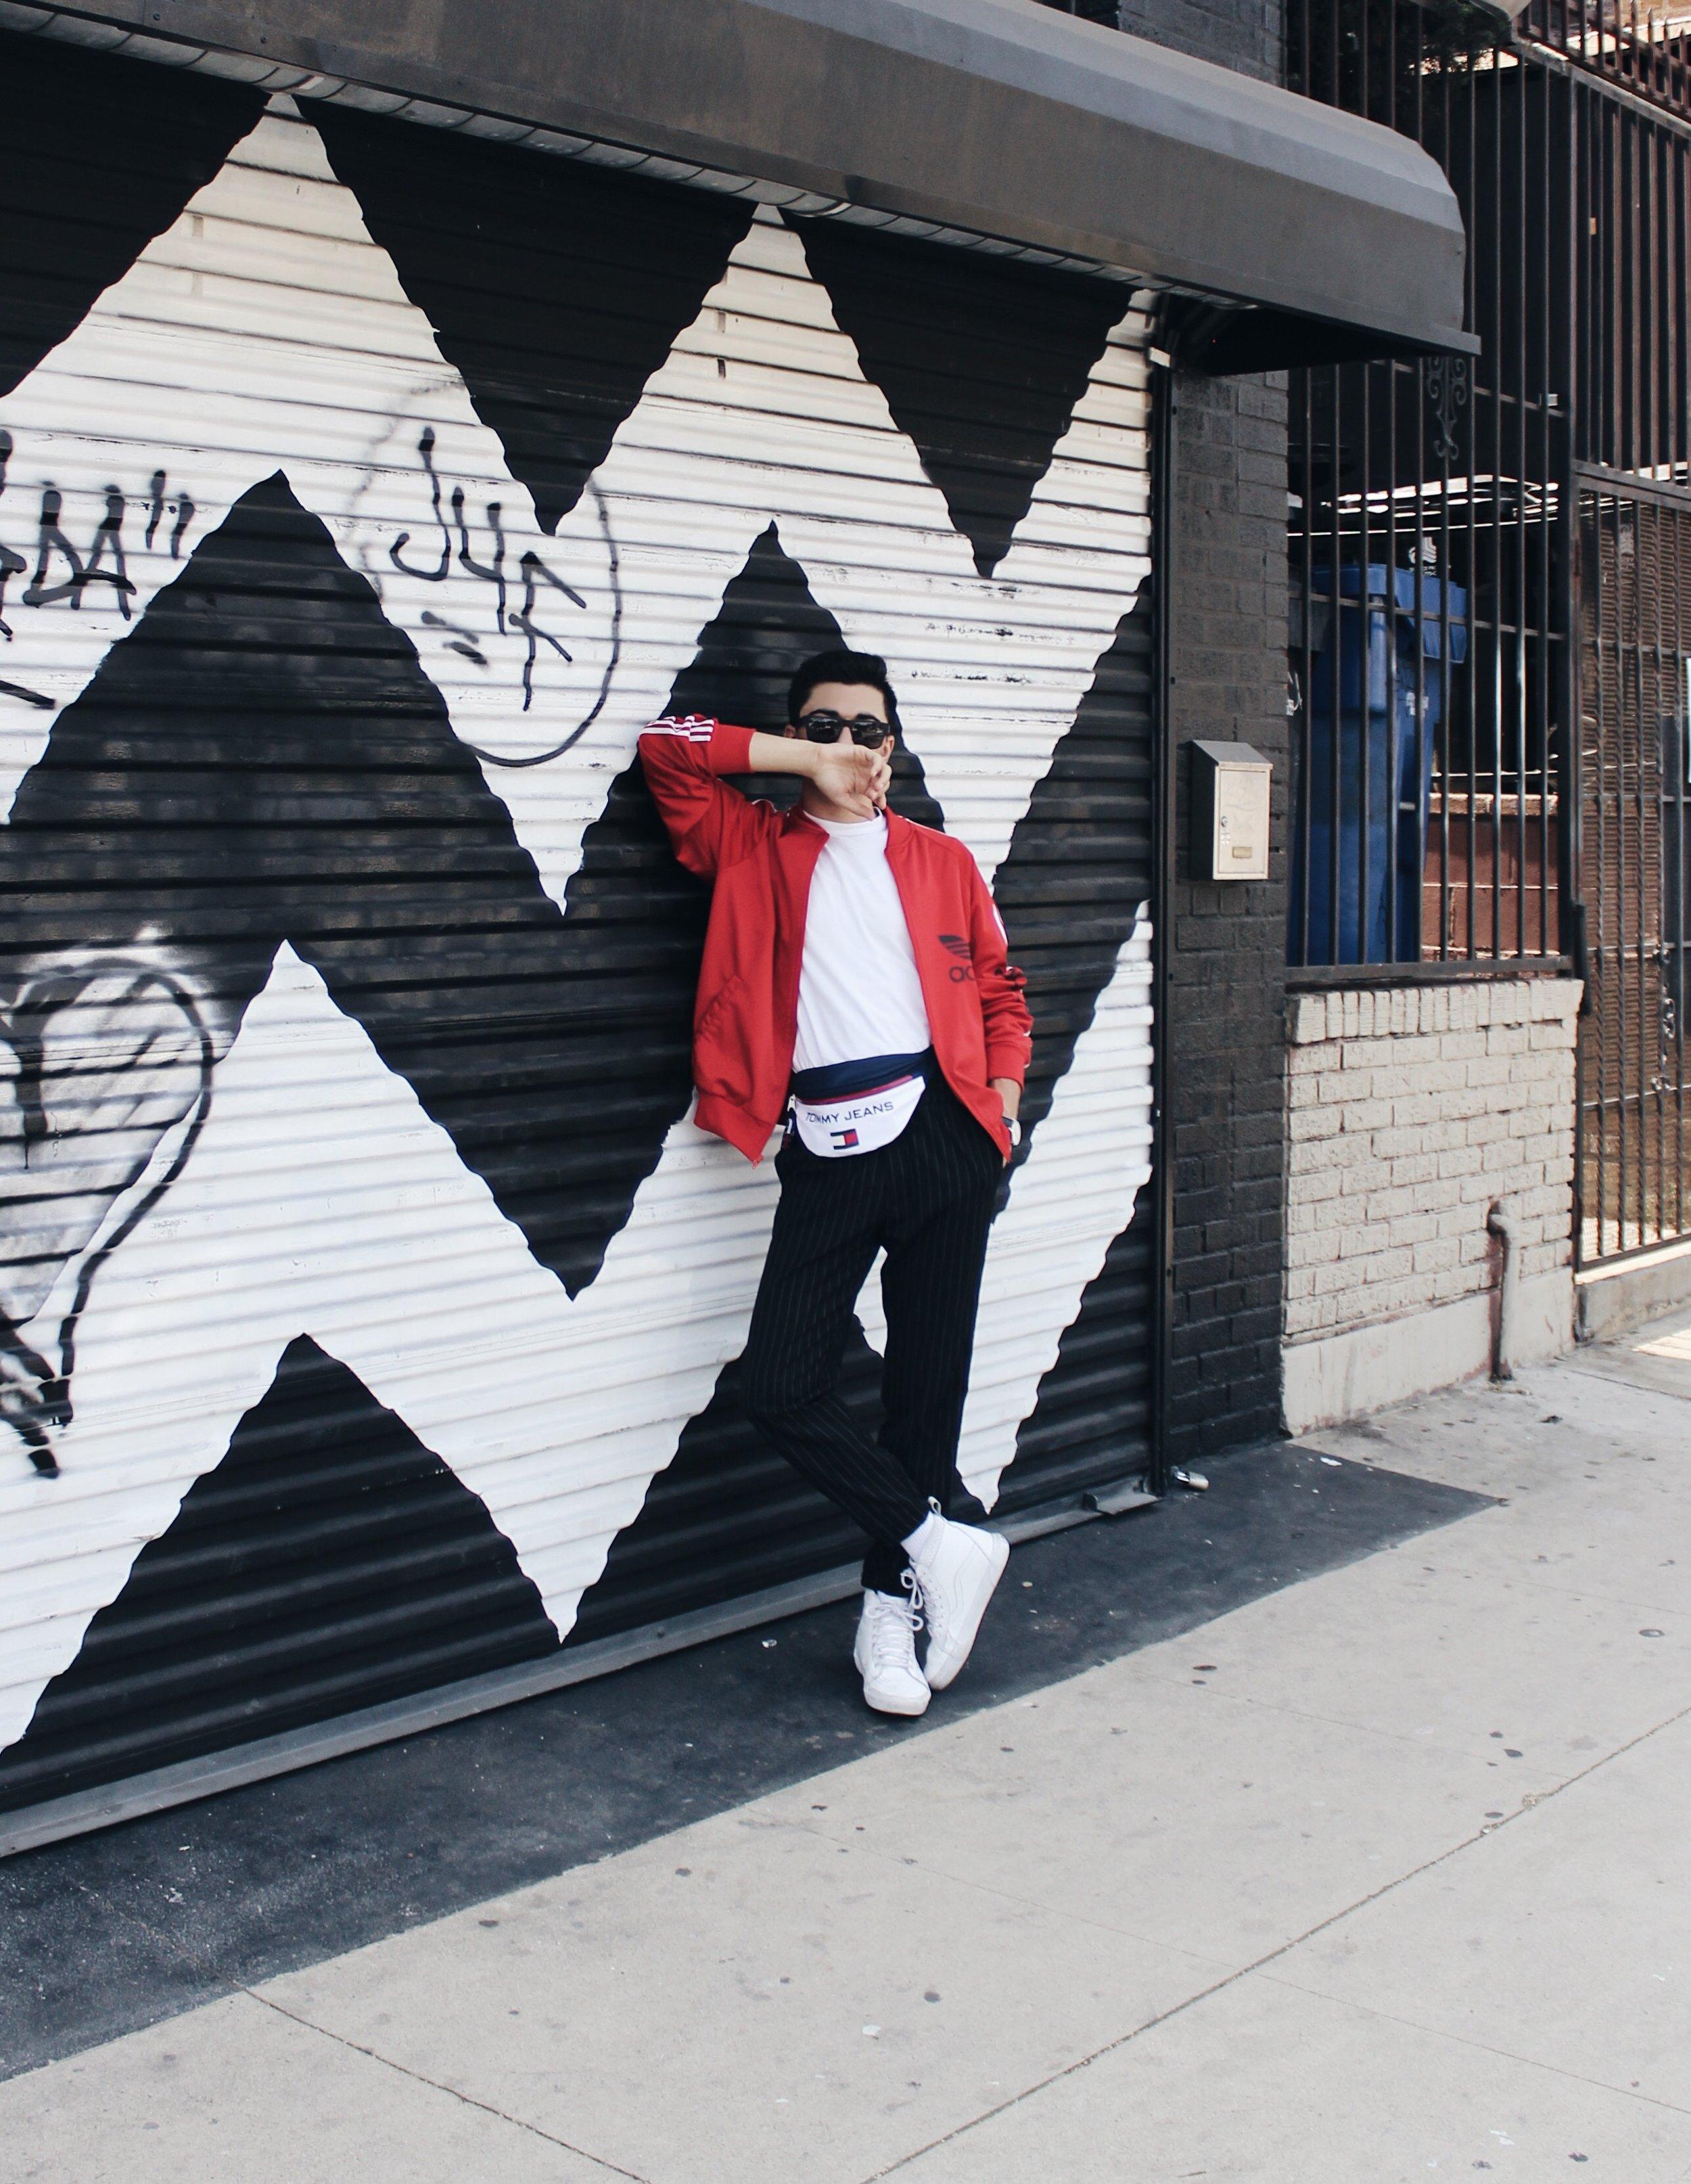 Jacket: Vintage  Adidas  (similar one linked) / Pants:  Urban Outfitters  / Tee:  Stafford  / Belt bag:  Tommy Jeans  / Shoes:  Vans  / Sunglasses:  Proof Eyewear  / Watch:  Daniel Wellington